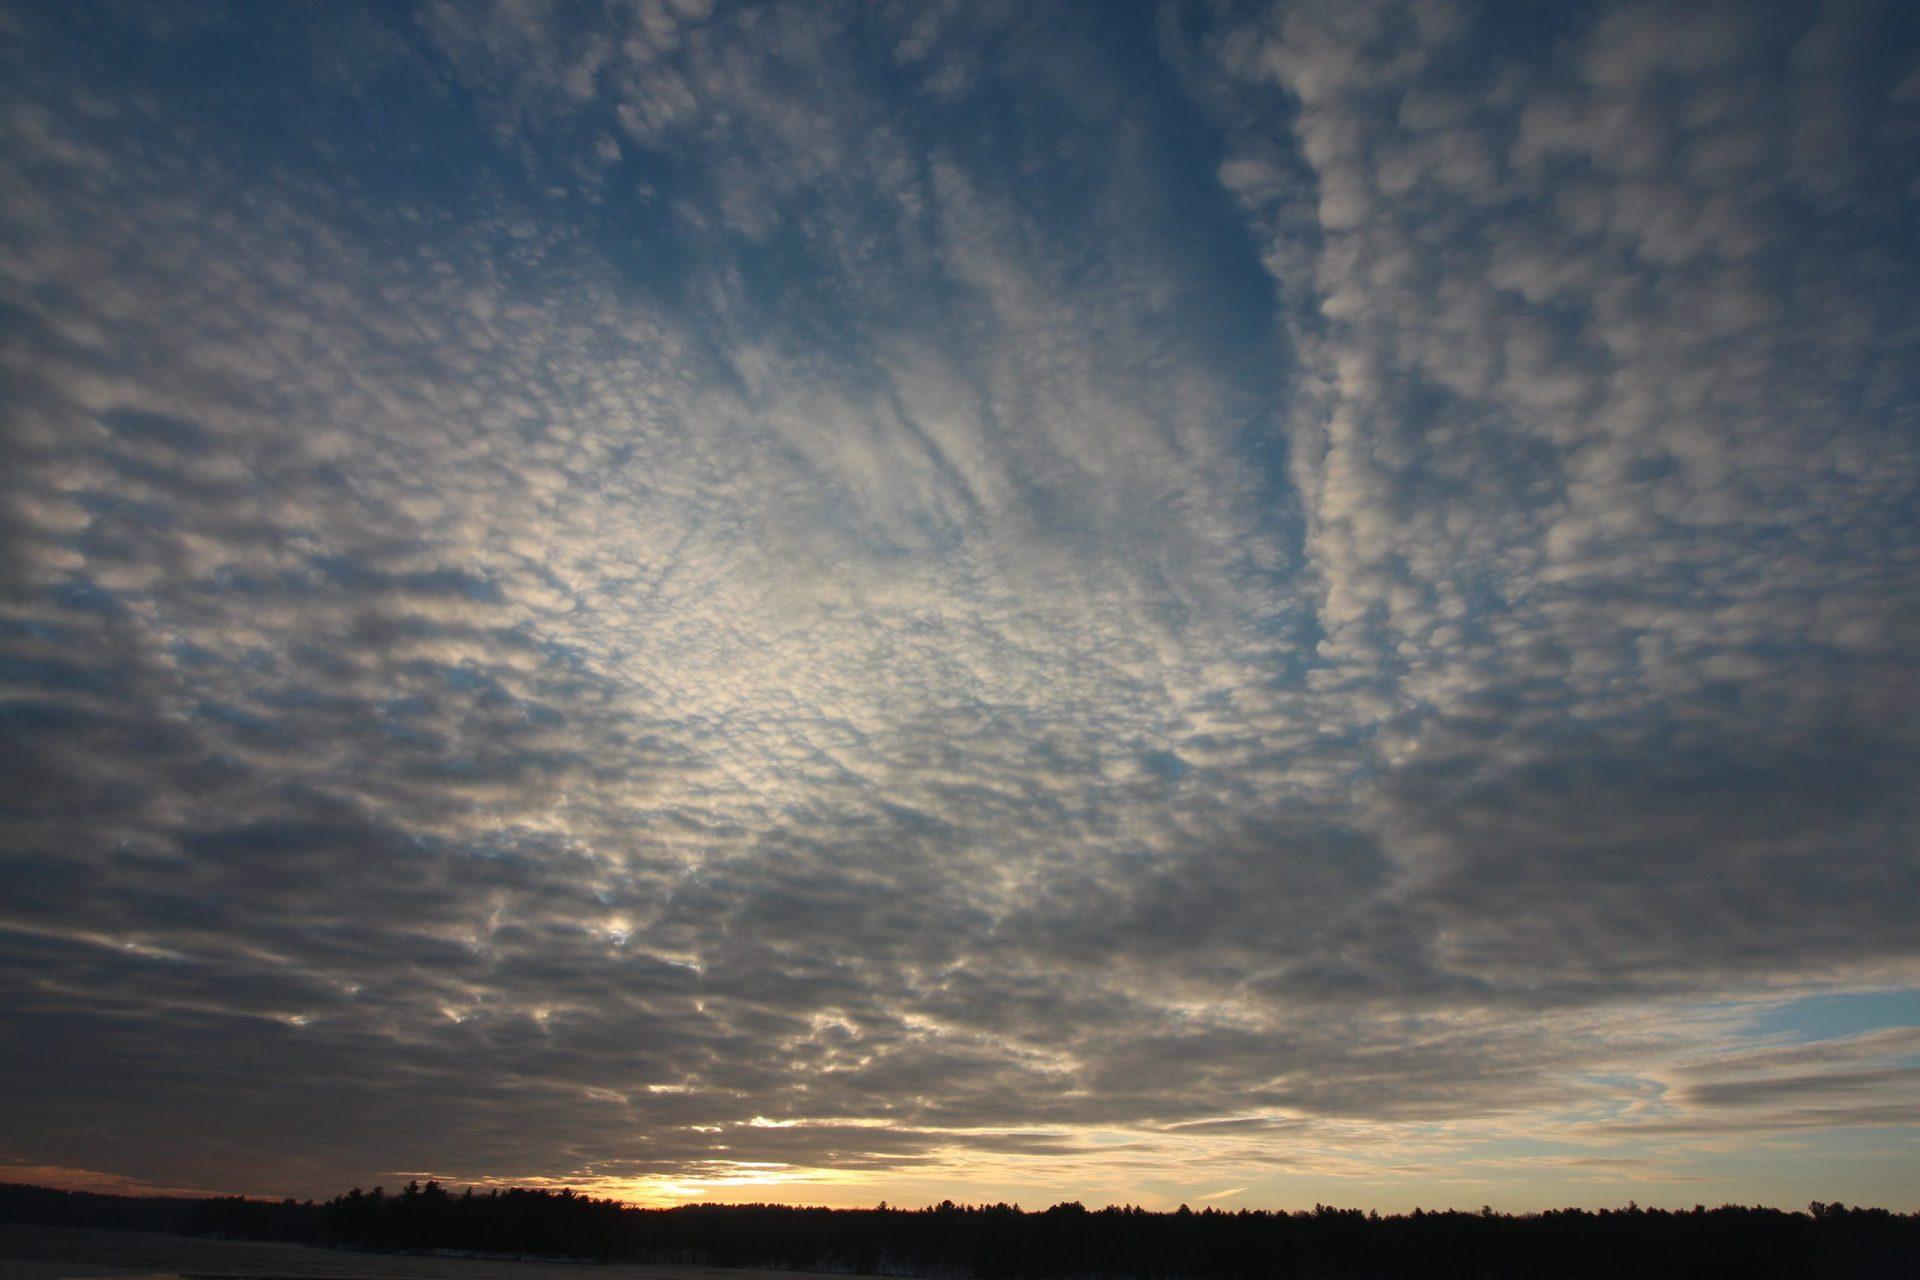 December 2020 sunset Ashland State Park